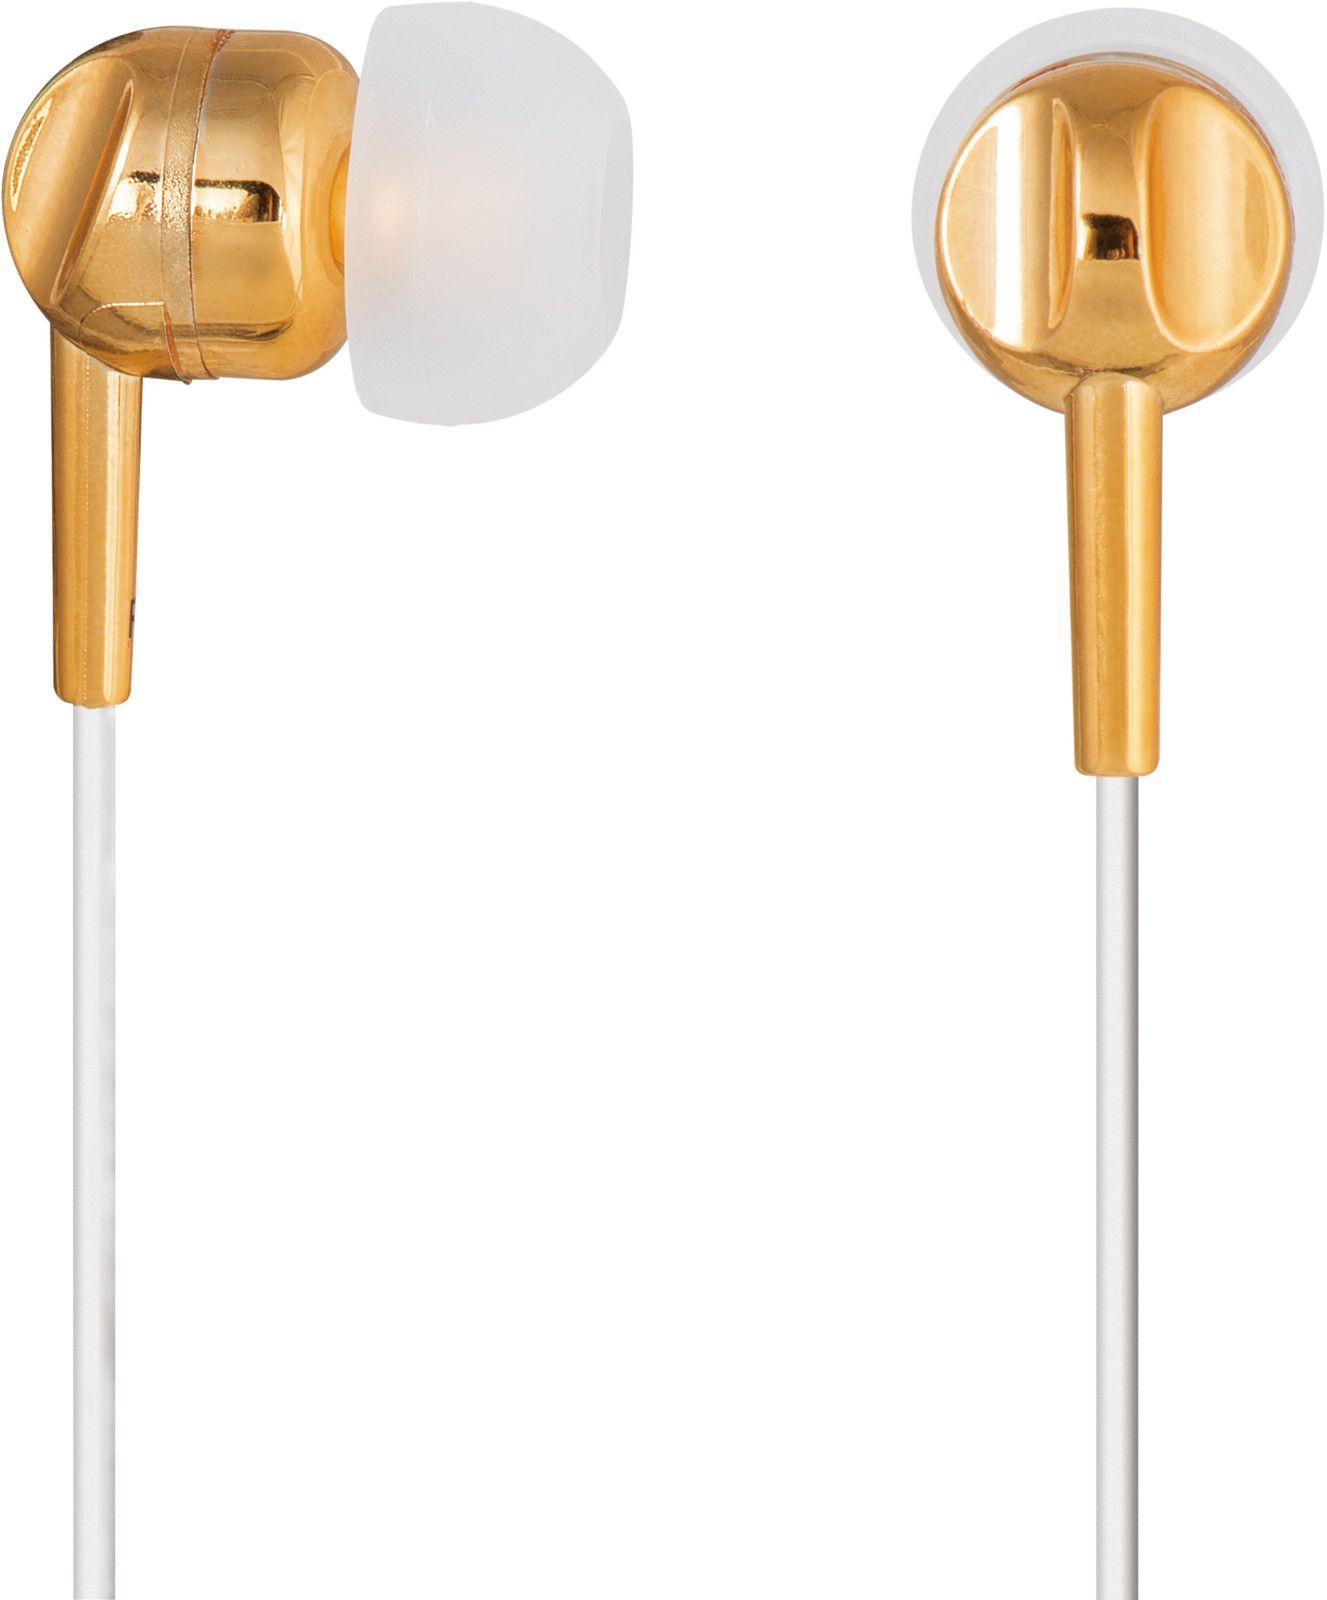 Thomson Headset EAR3005 - Guld